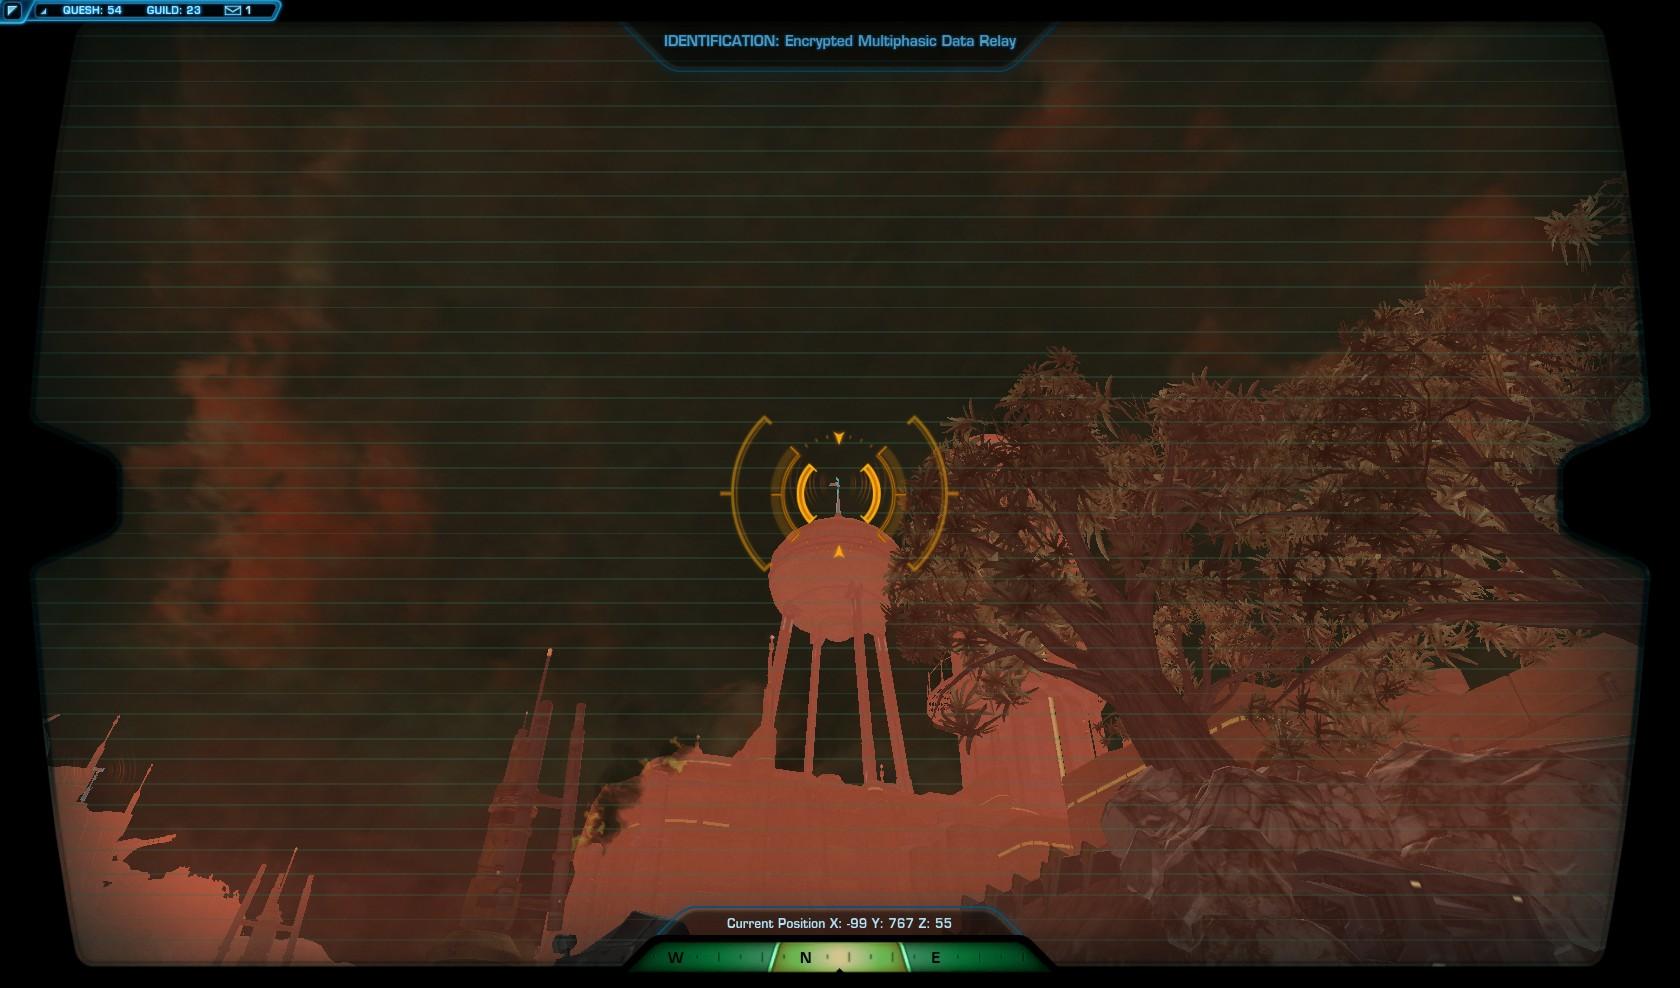 Swtor A Secret Revealed Macrobinoculars Mission